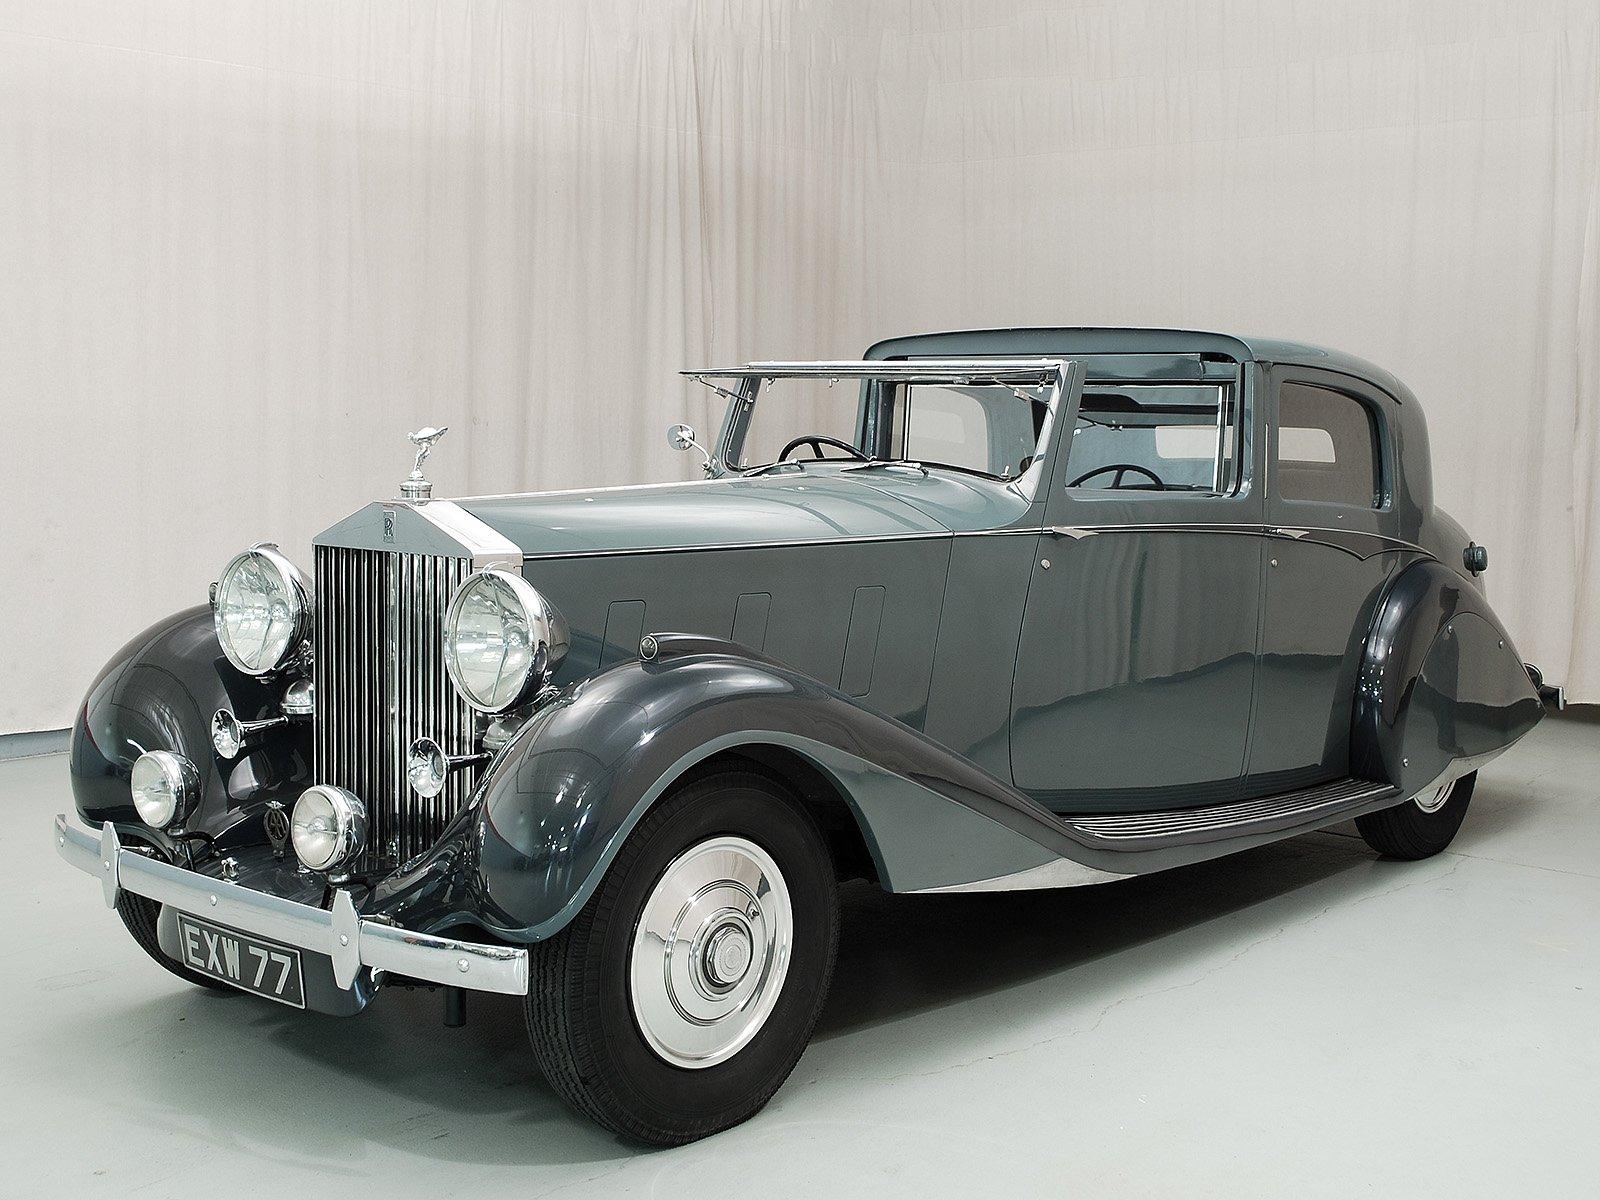 1938 rolls royce phantom iii hyman ltd classic cars. Black Bedroom Furniture Sets. Home Design Ideas